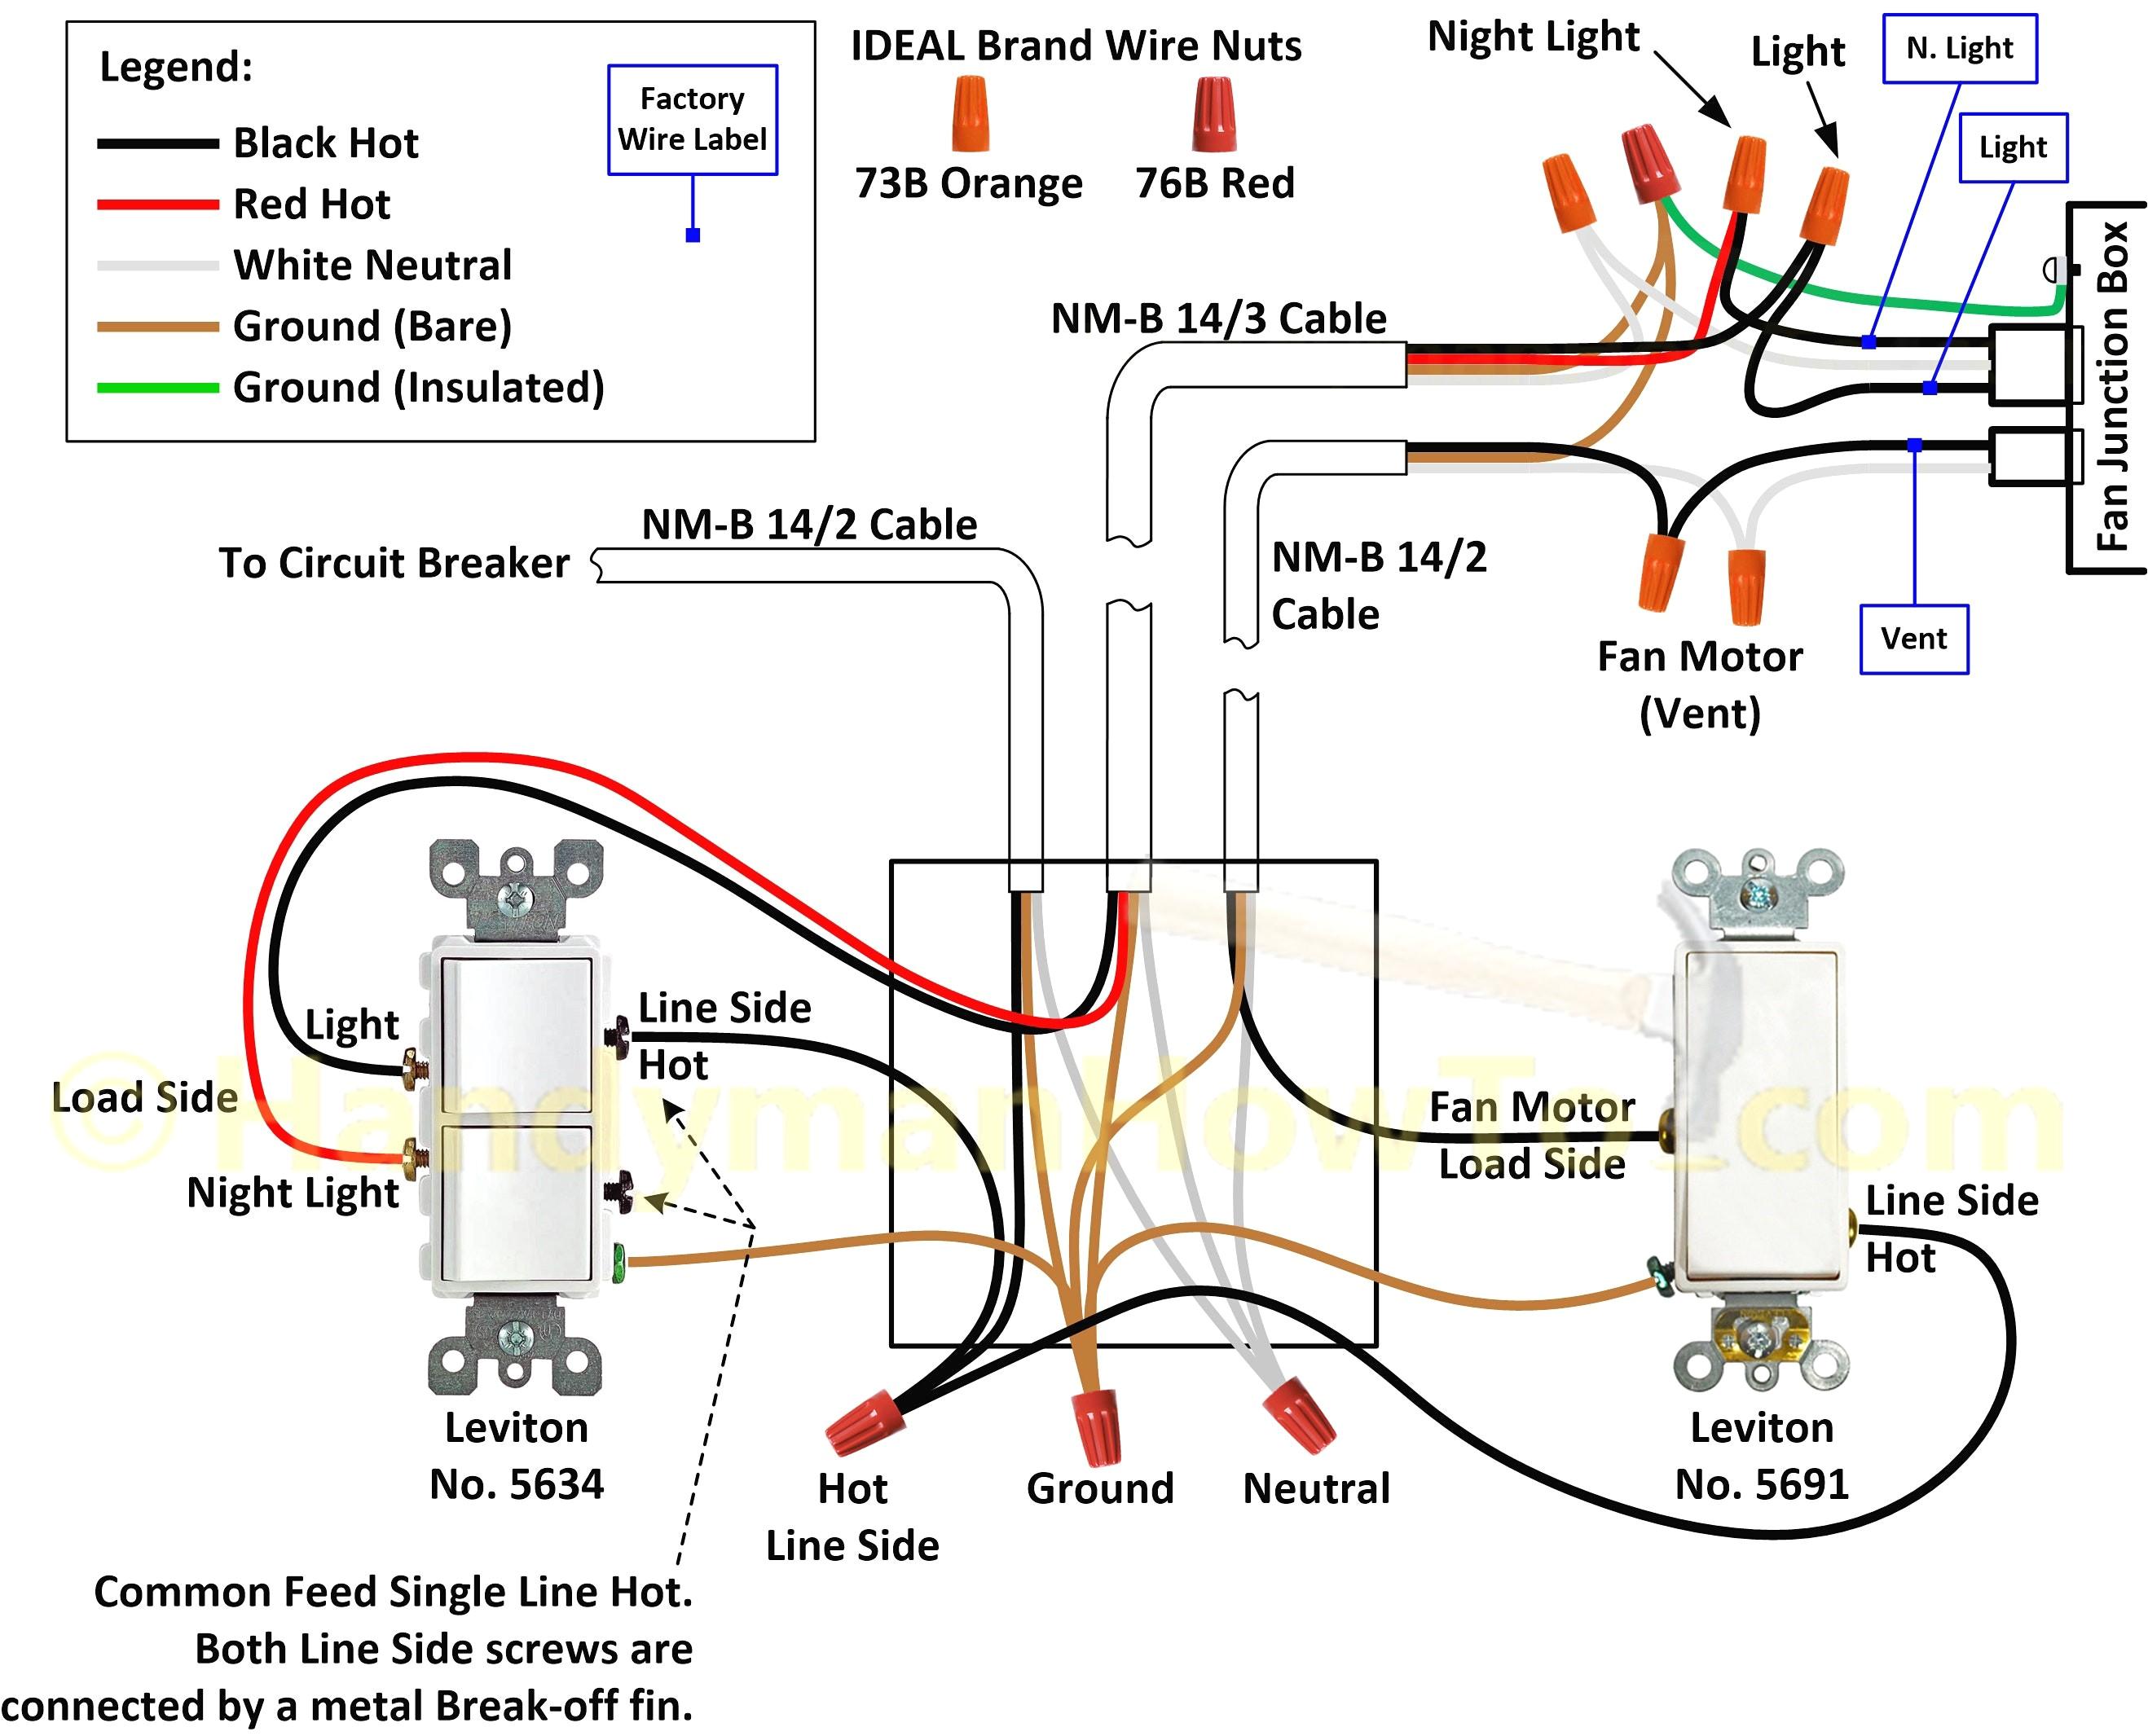 crest ceiling fan wiring diagram wiring diagram center crest ceiling fan wiring diagram crest ceiling fan wiring diagram